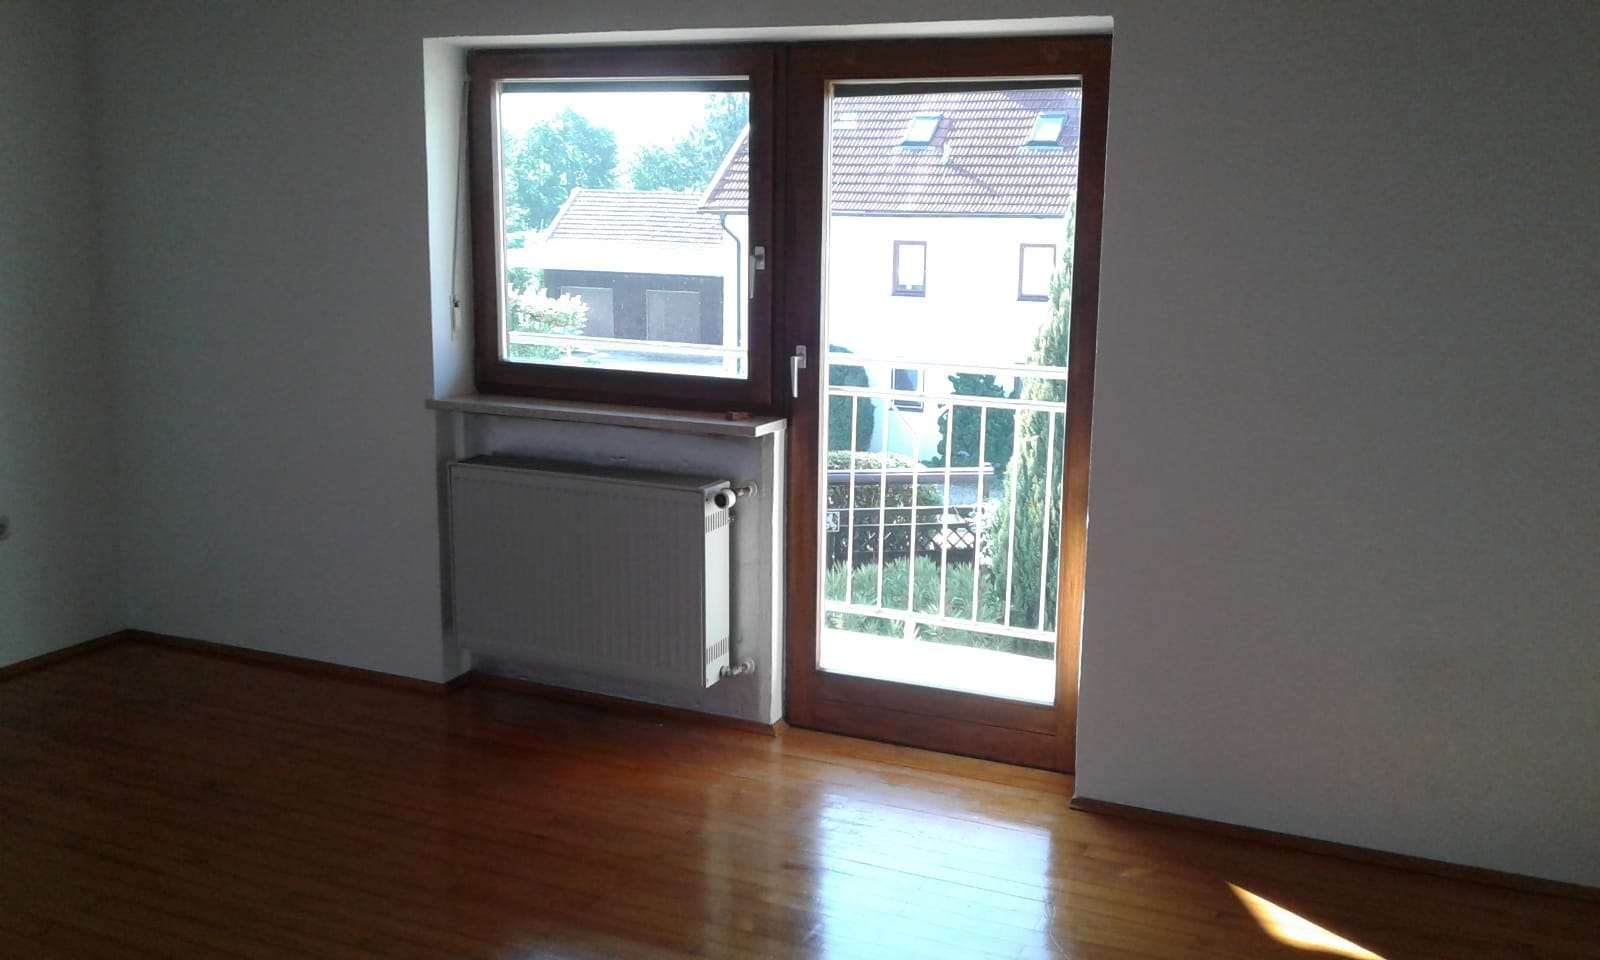 2-Zimmer-Wohnung mit Balkon in Zolling in Zolling